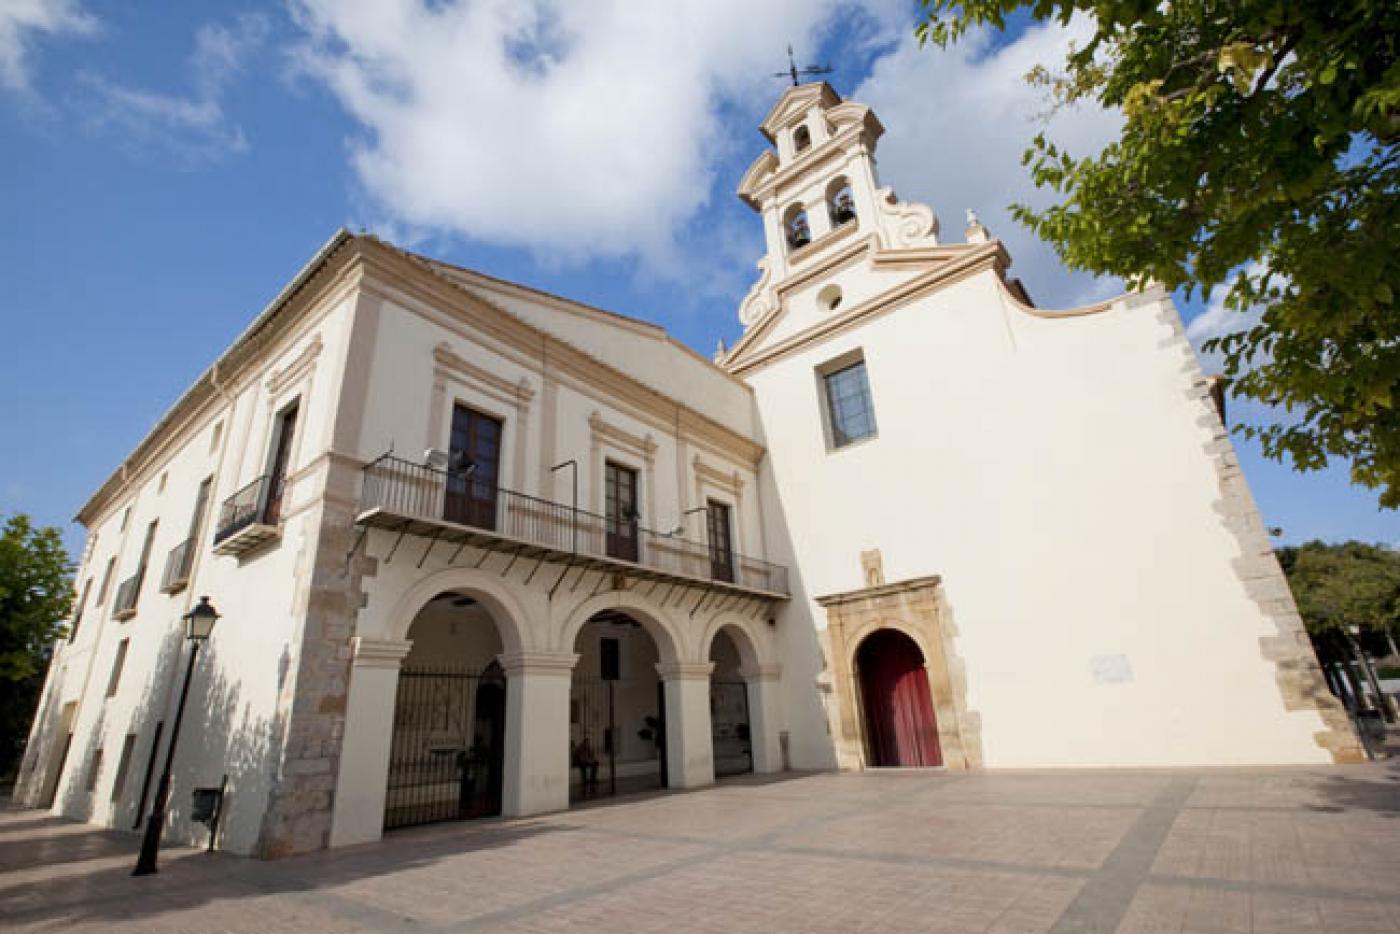 Basilica de LLedo